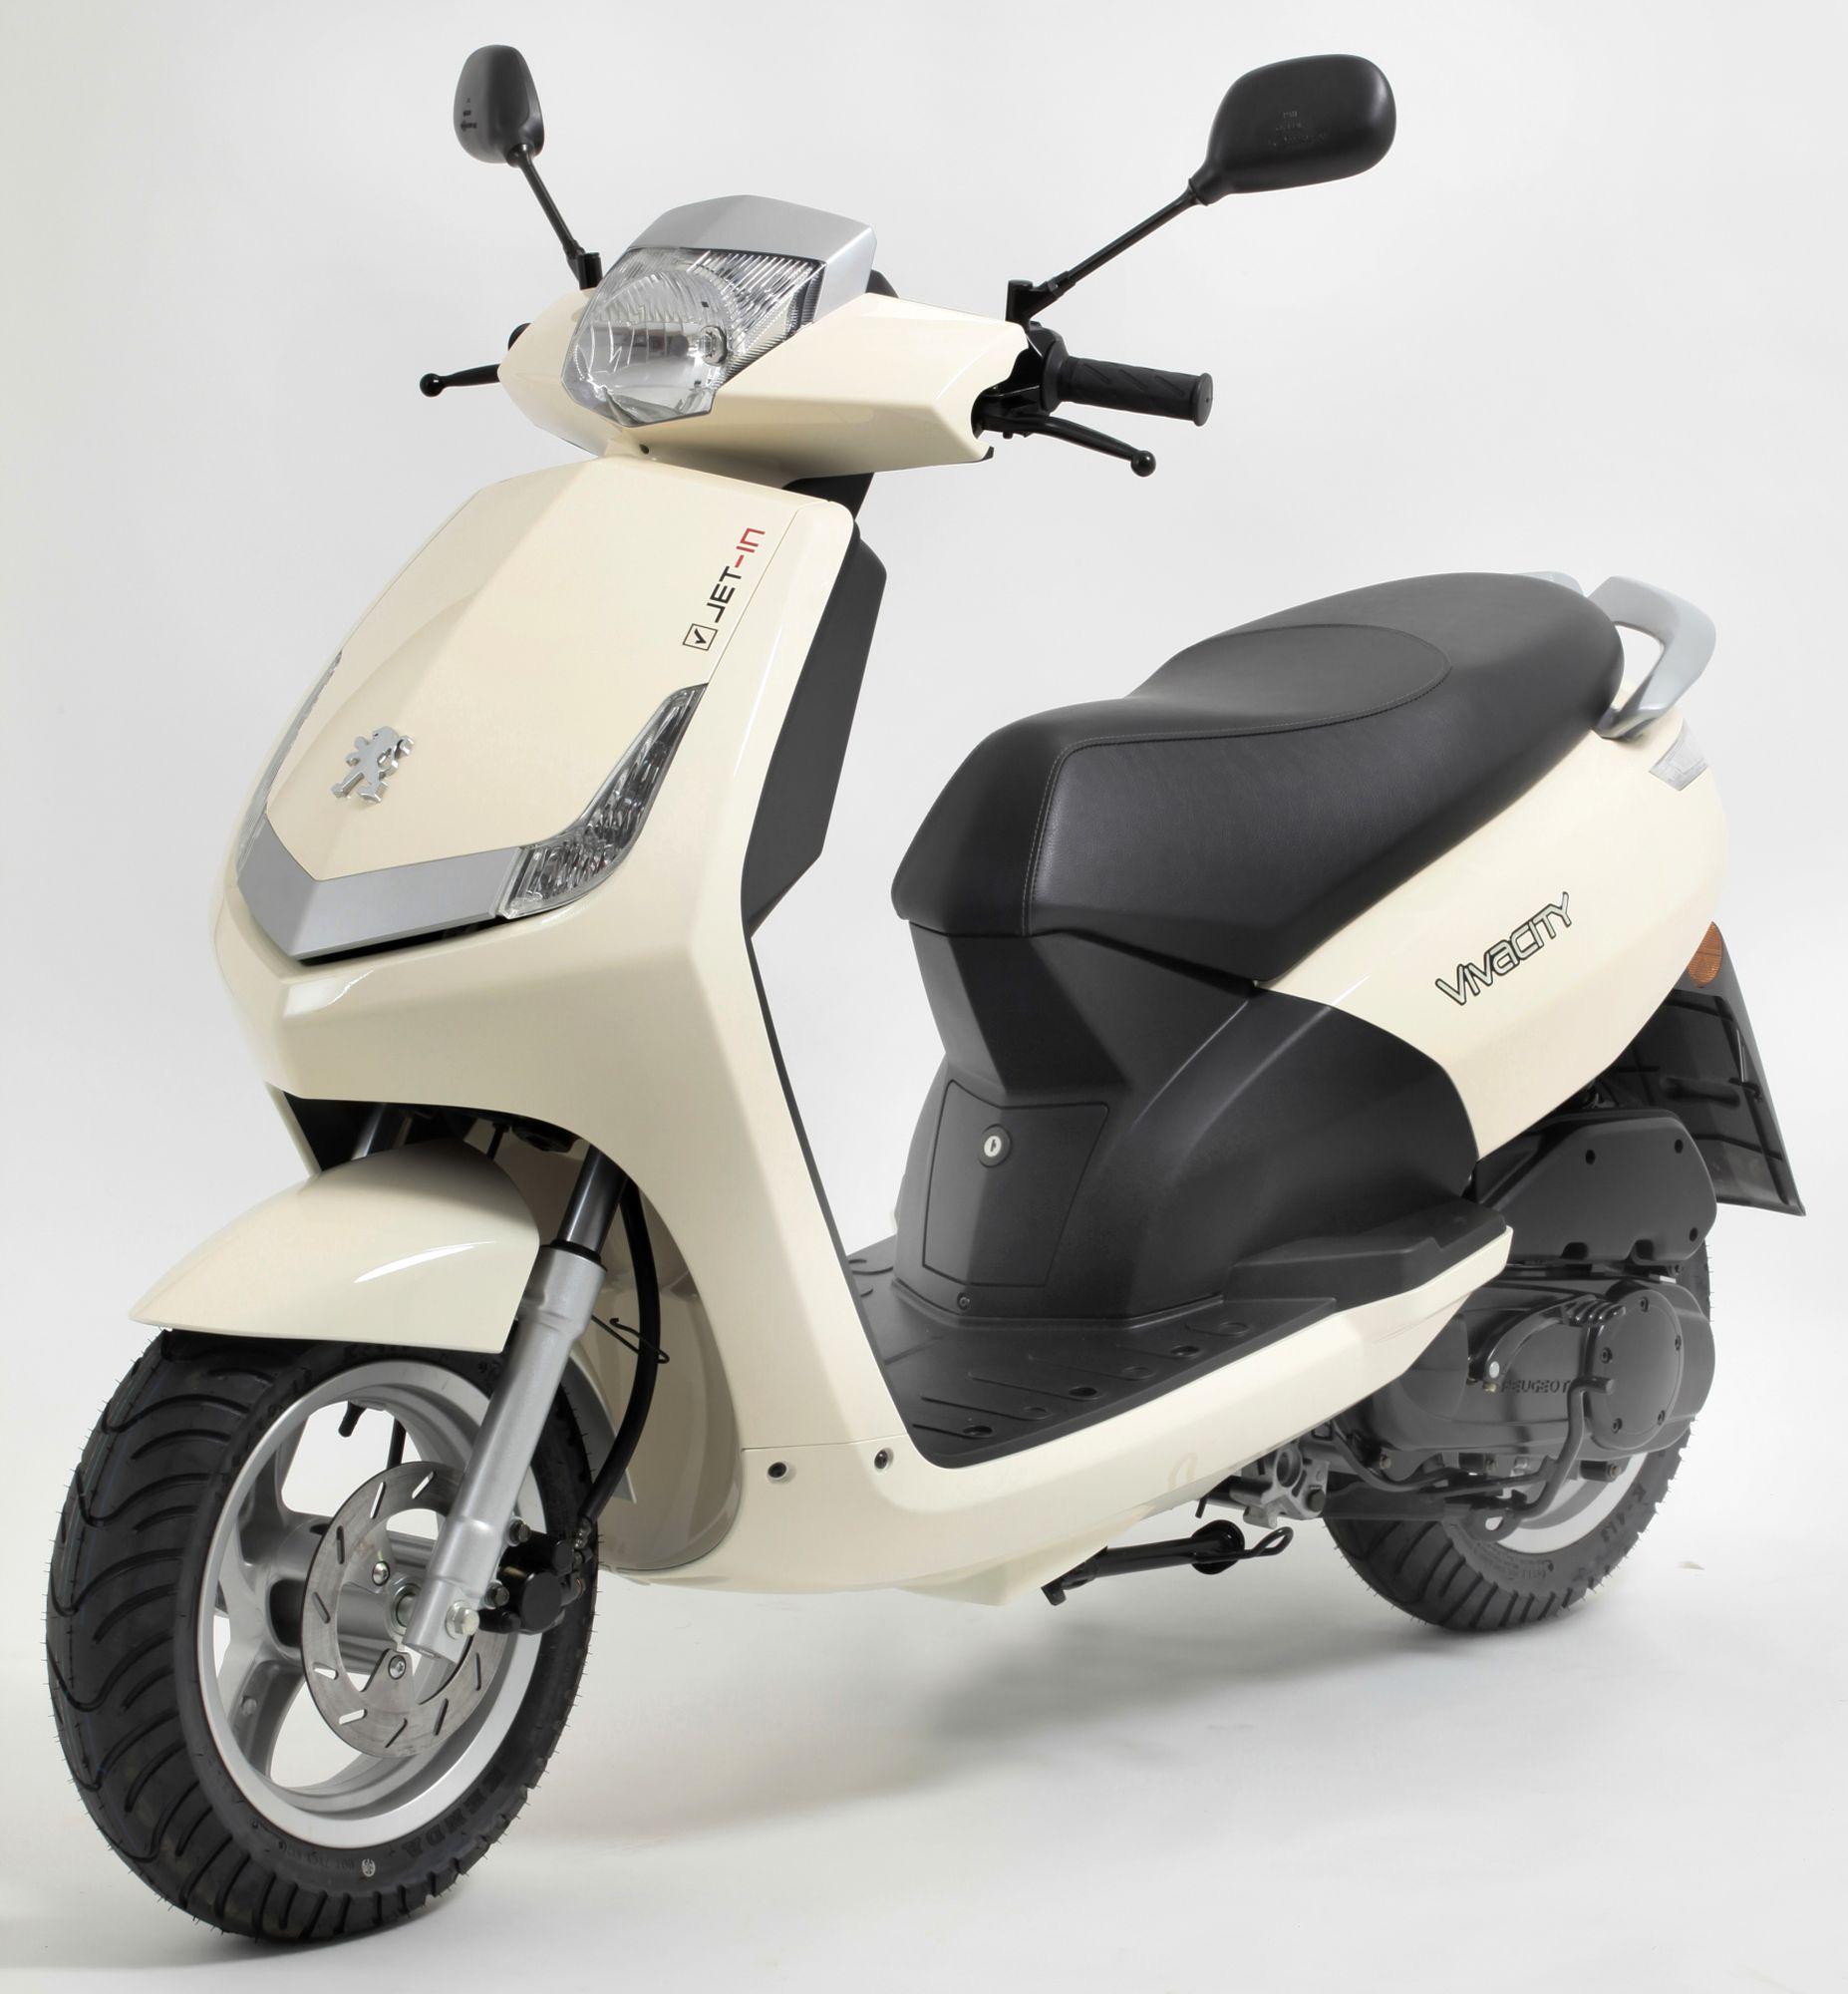 peugeot vivacity 4t 50 all technical data of the model vivacity 4t rh bike shop cc Tuning Peugeot Speedfight 3 Peugeot Jet Force